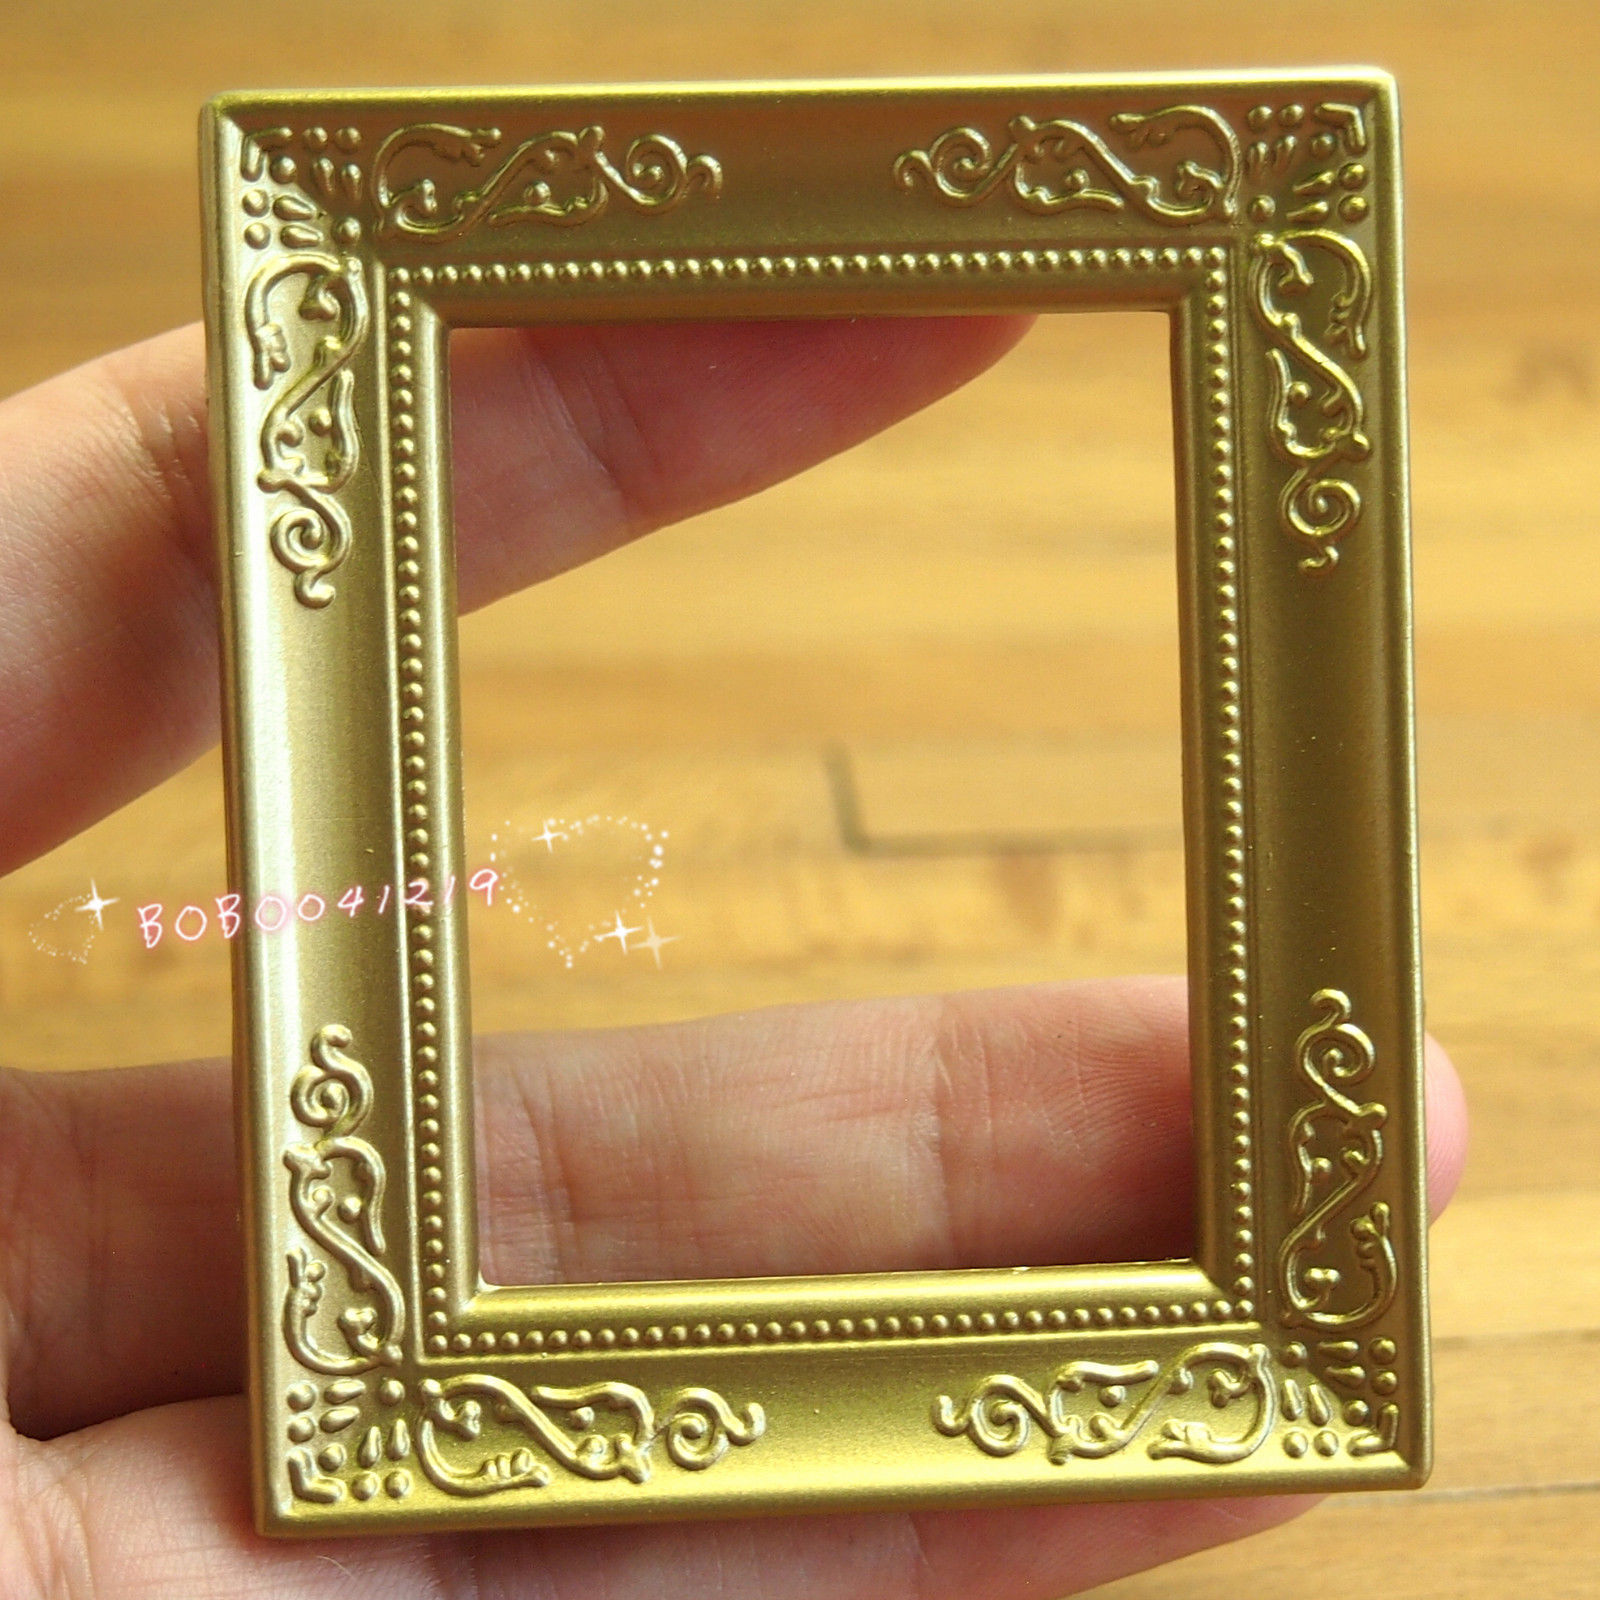 Dollhouse Miniature 1:12 Toy A Plastic Golden Frame Length 6.3cm SPO341(China (Mainland))